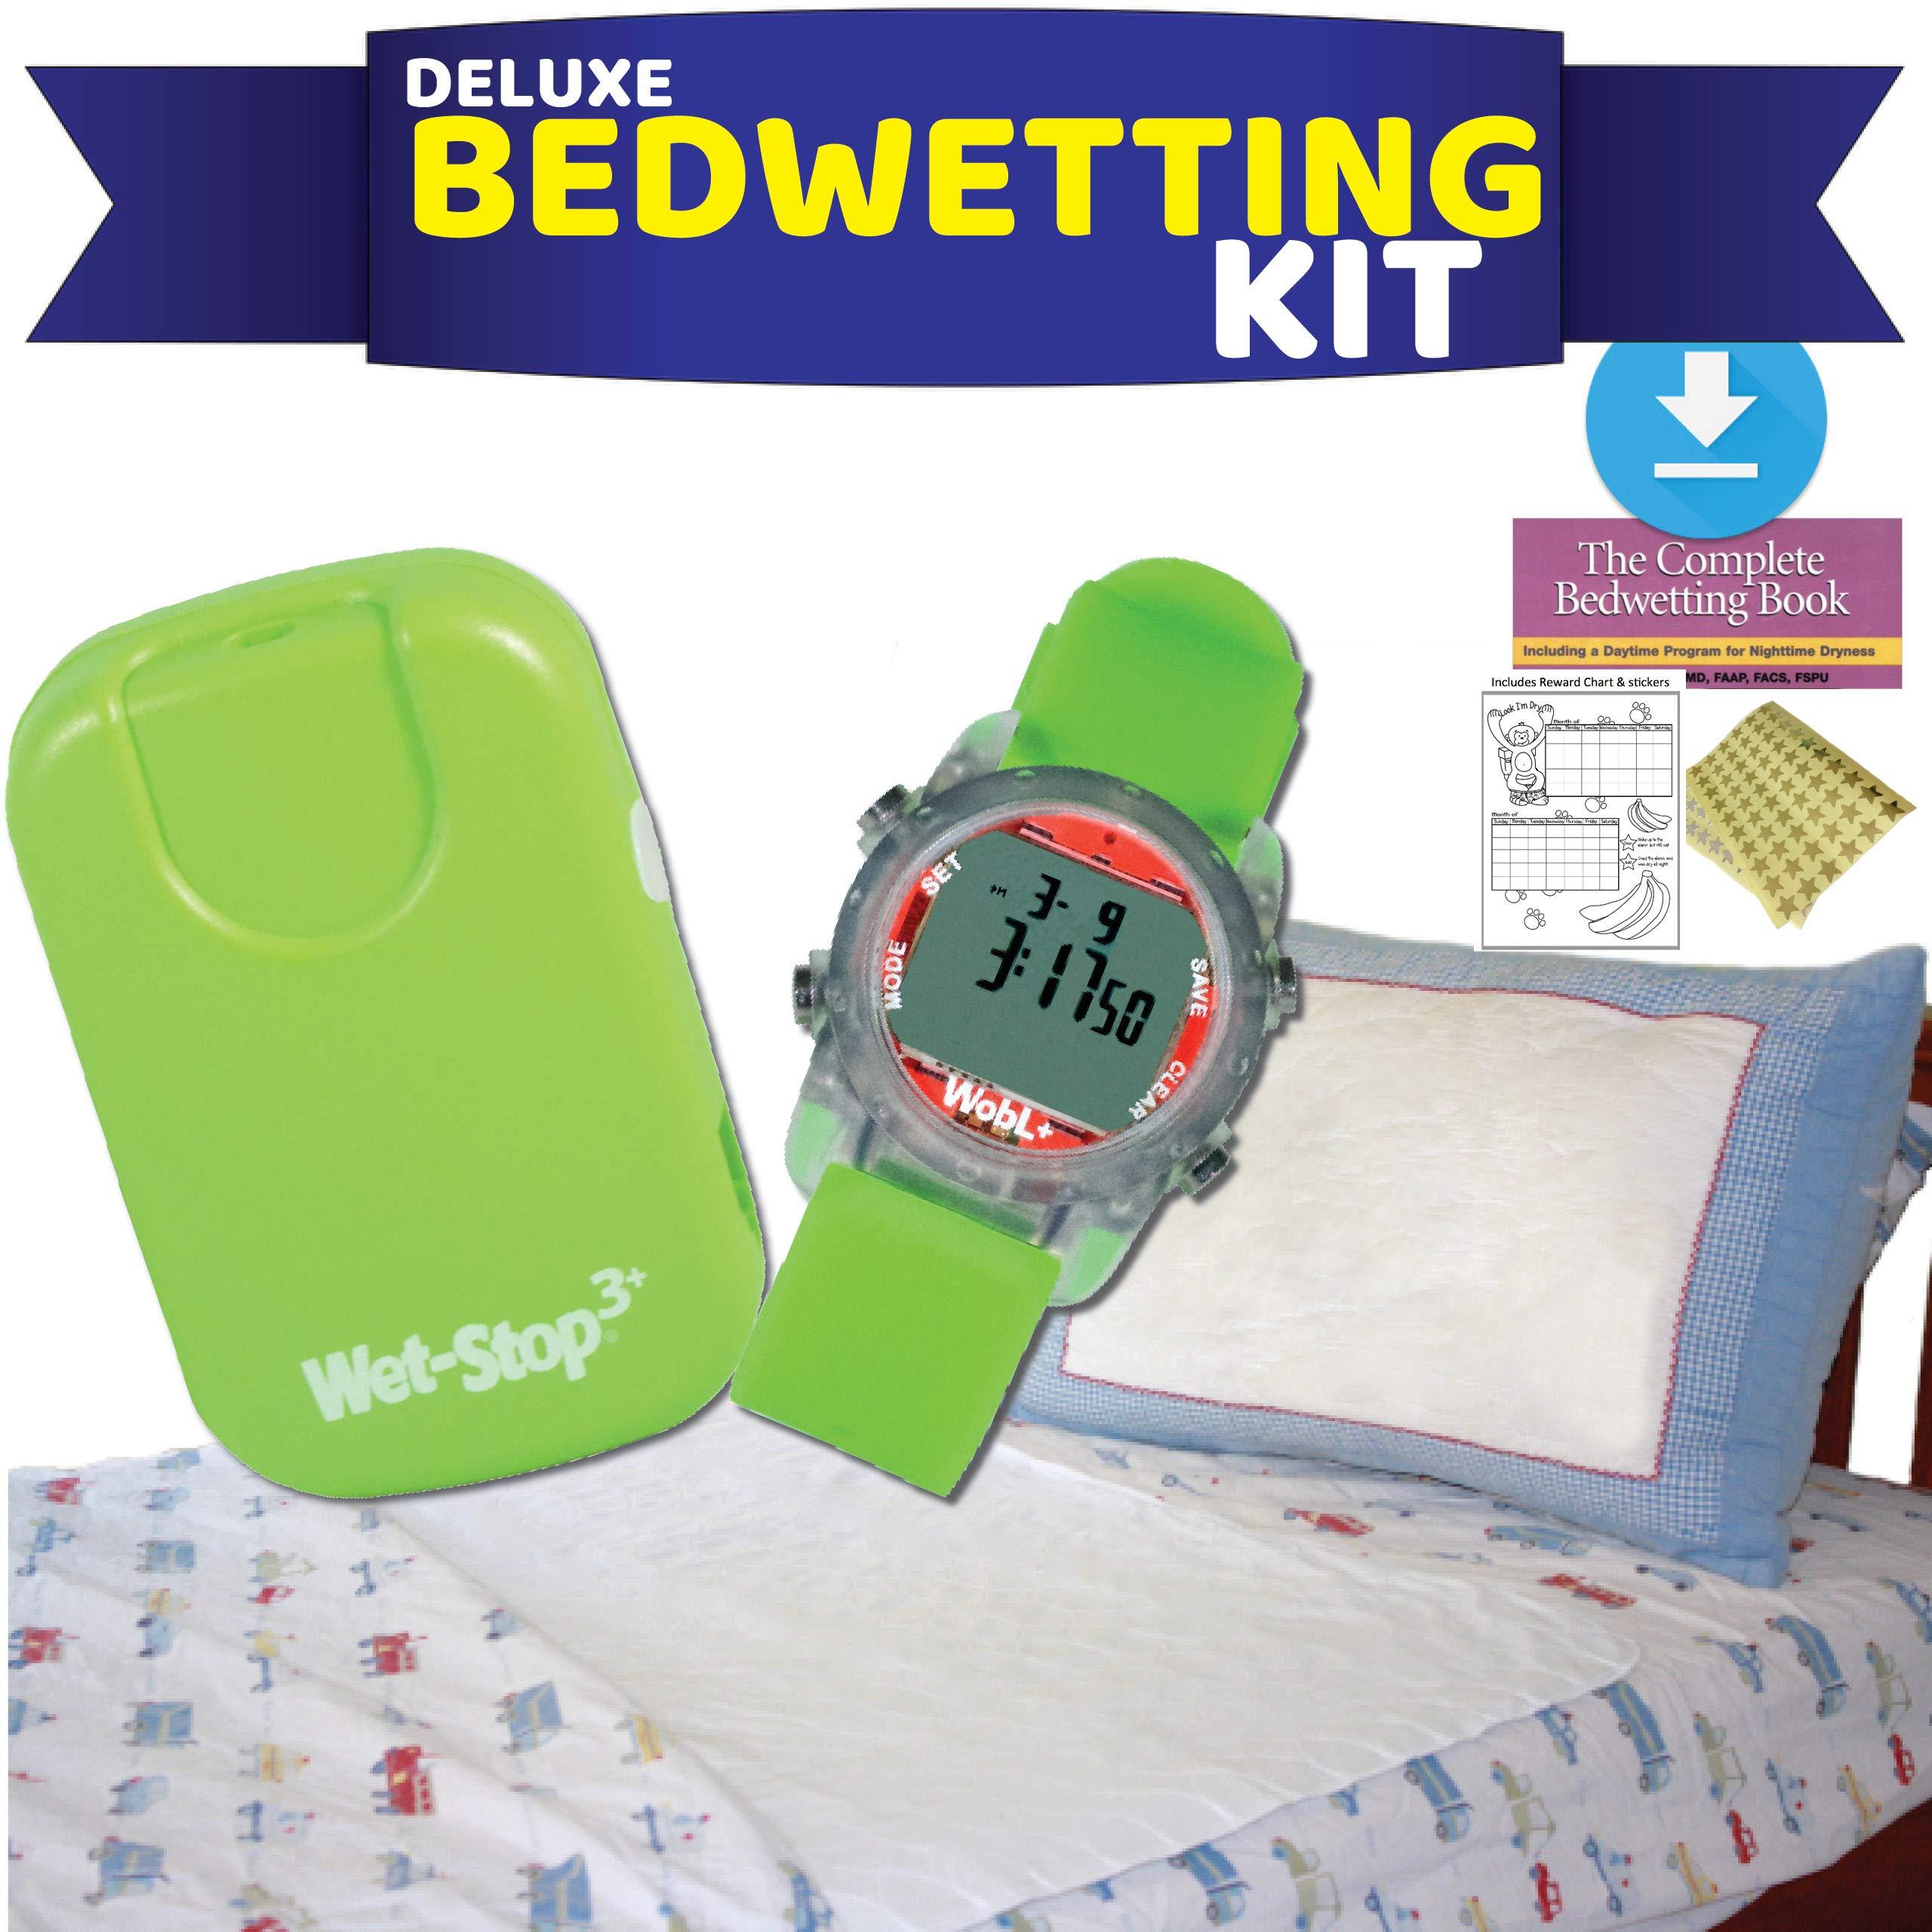 Deluxe Bedwetting Kit-Wet Stop Bedwetting Alarm, WobL + Waterproof Watch, Waterproof Mattress Pad by Wet Stop